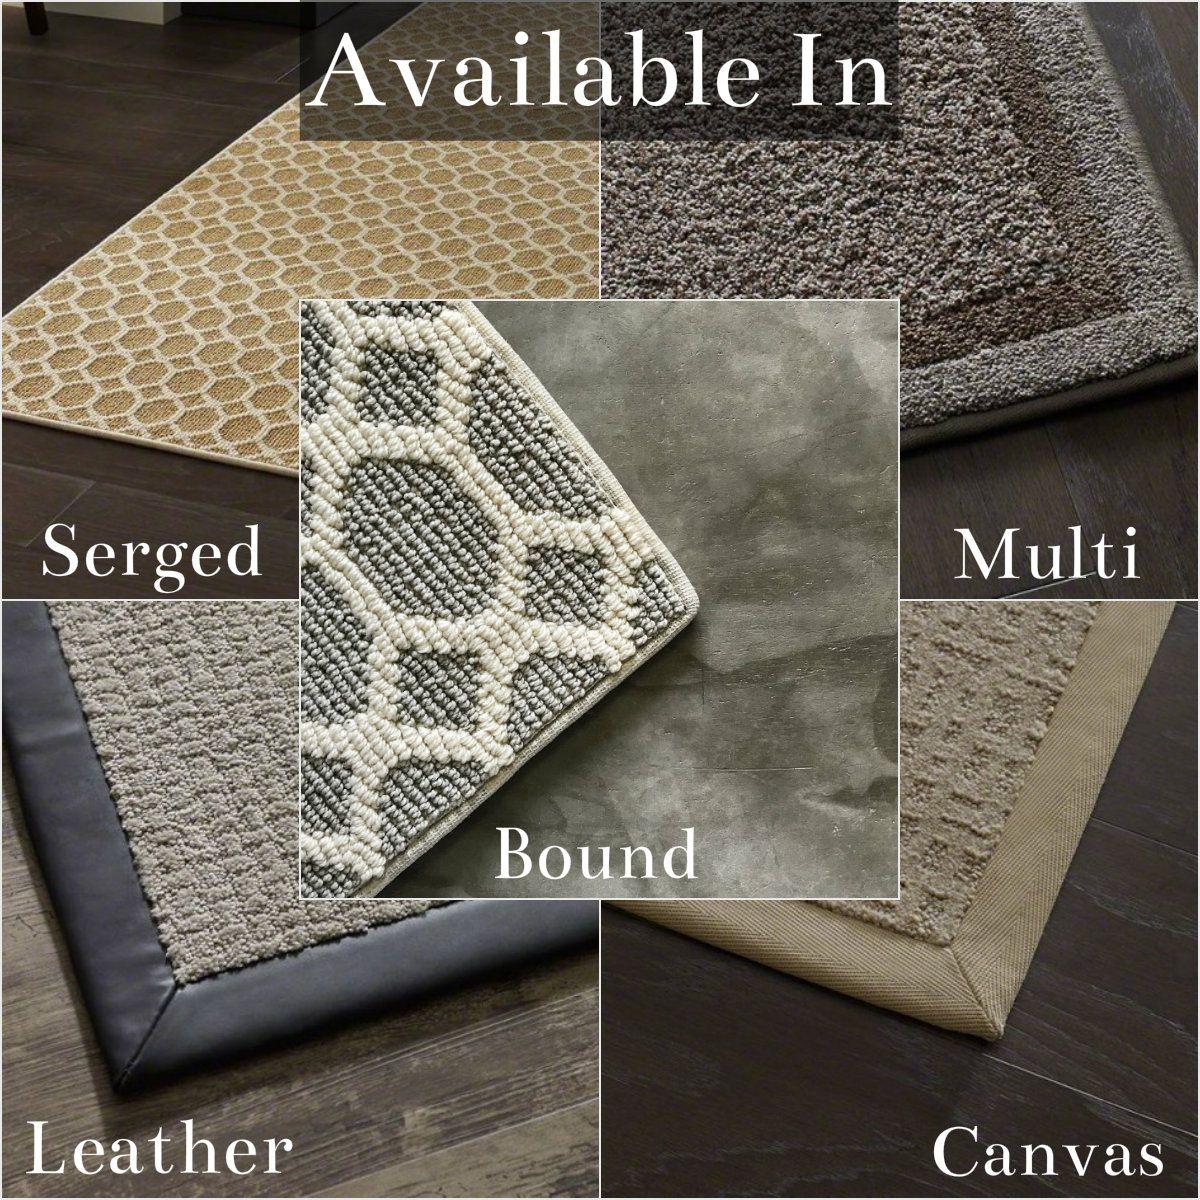 Available Area Rug Edges Area Rugs Carpet Flooring